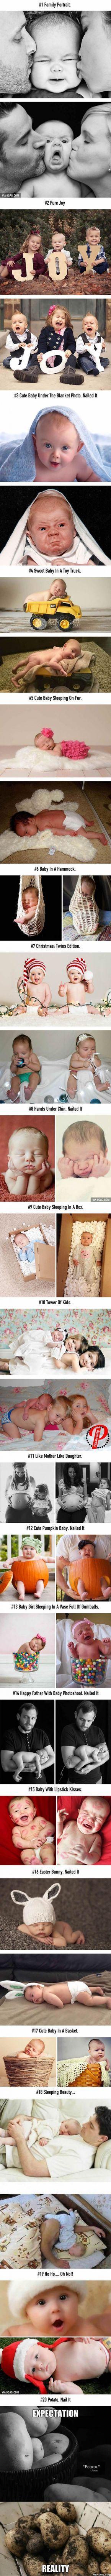 20 Hilarious Baby Photoshoot Fails